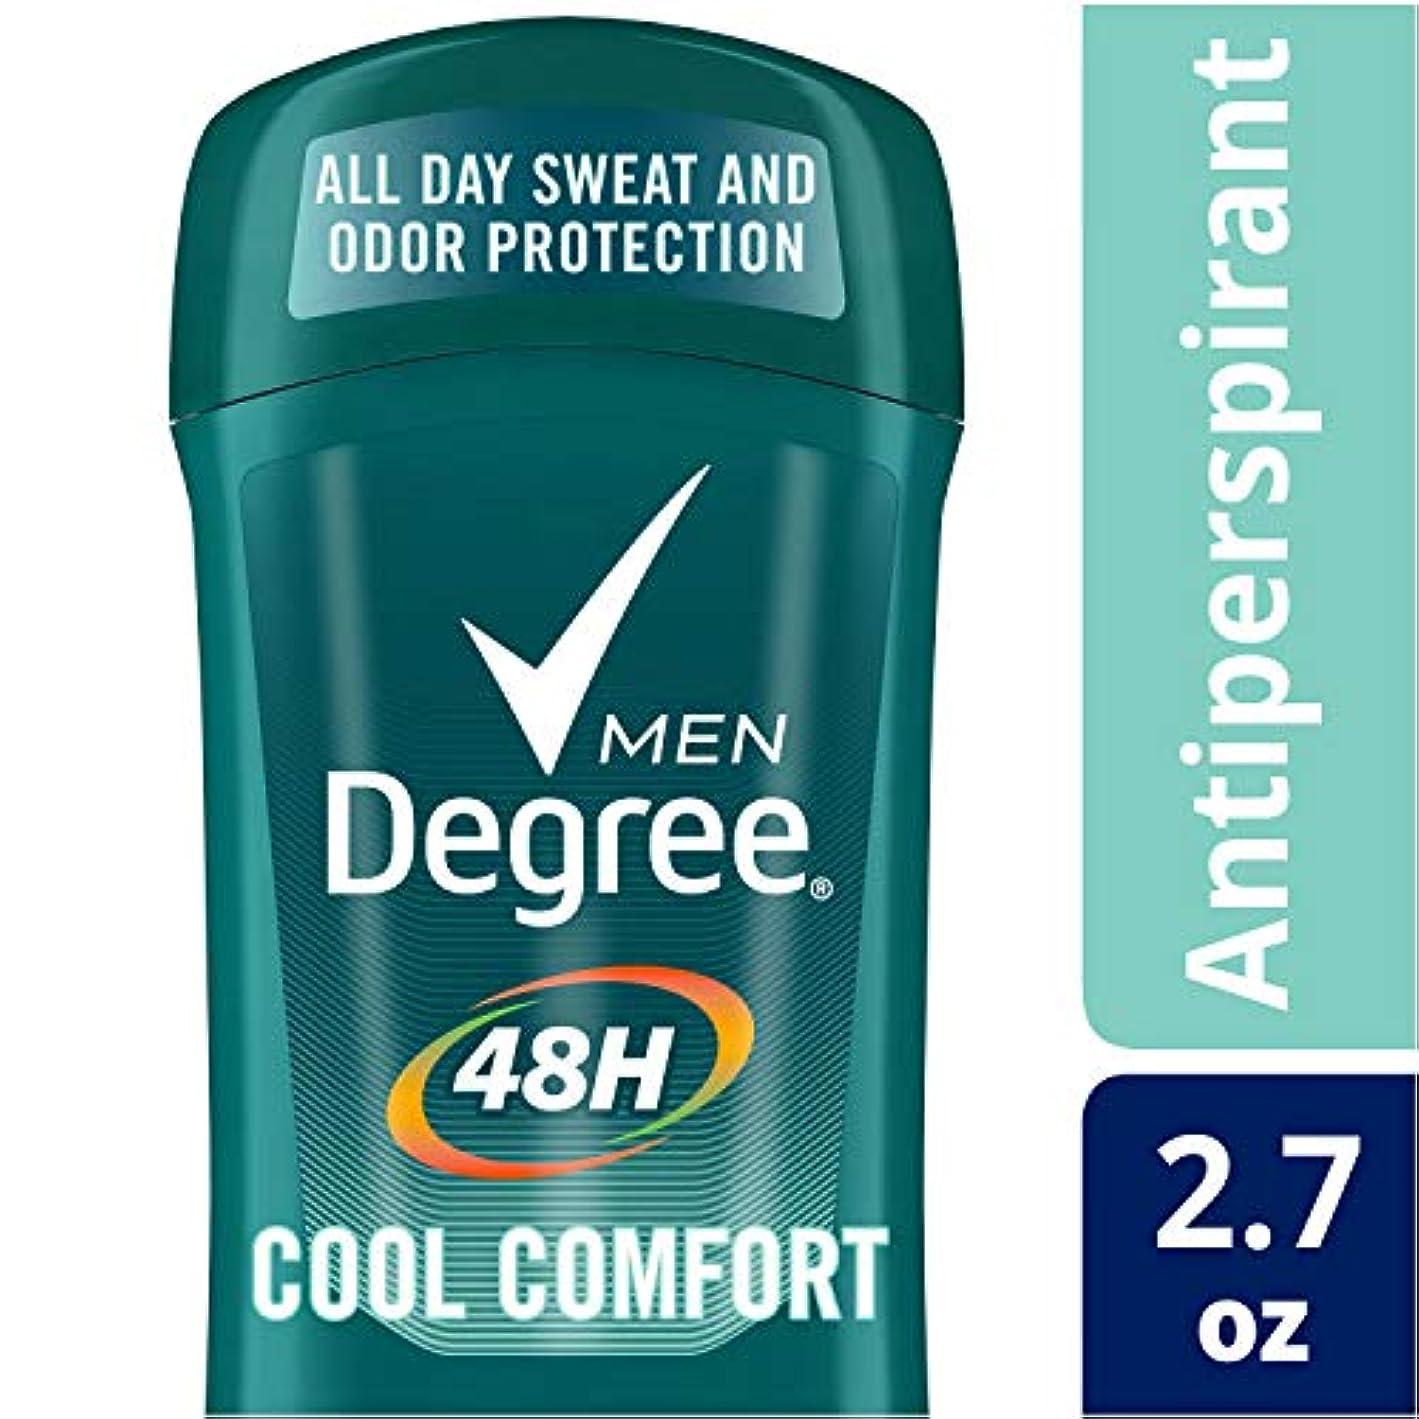 Cool Comfort Anti Perspirant Deodorant Stick (並行輸入品)